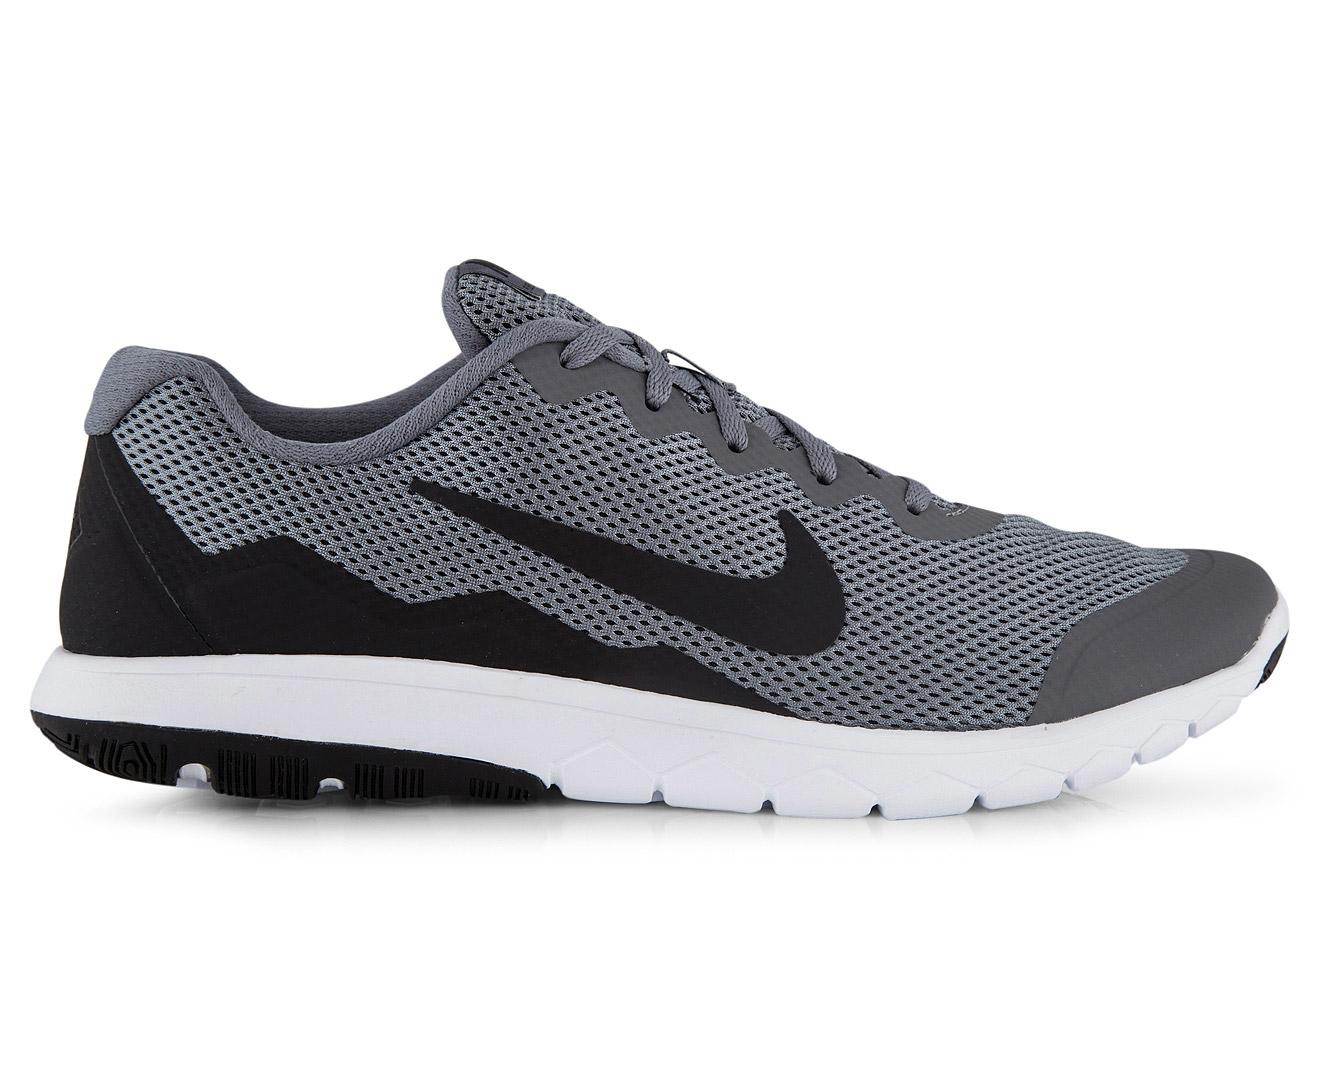 Nike Men's Flex Experience RN 4 Shoe Cool GreyBlackWhite